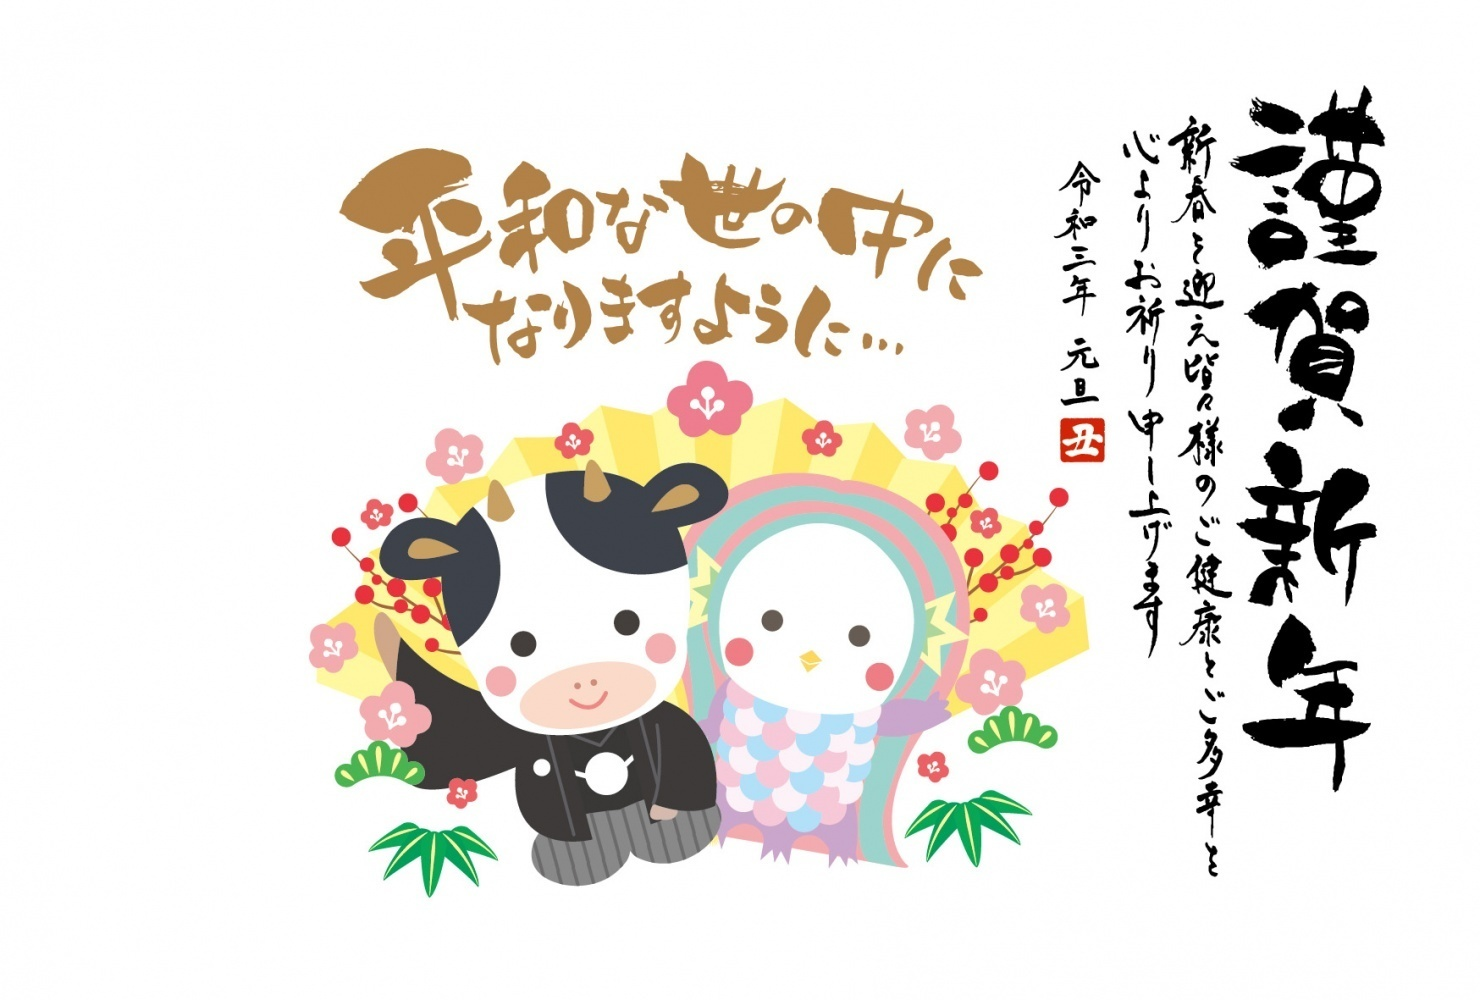 sozai_image_157568.jpg